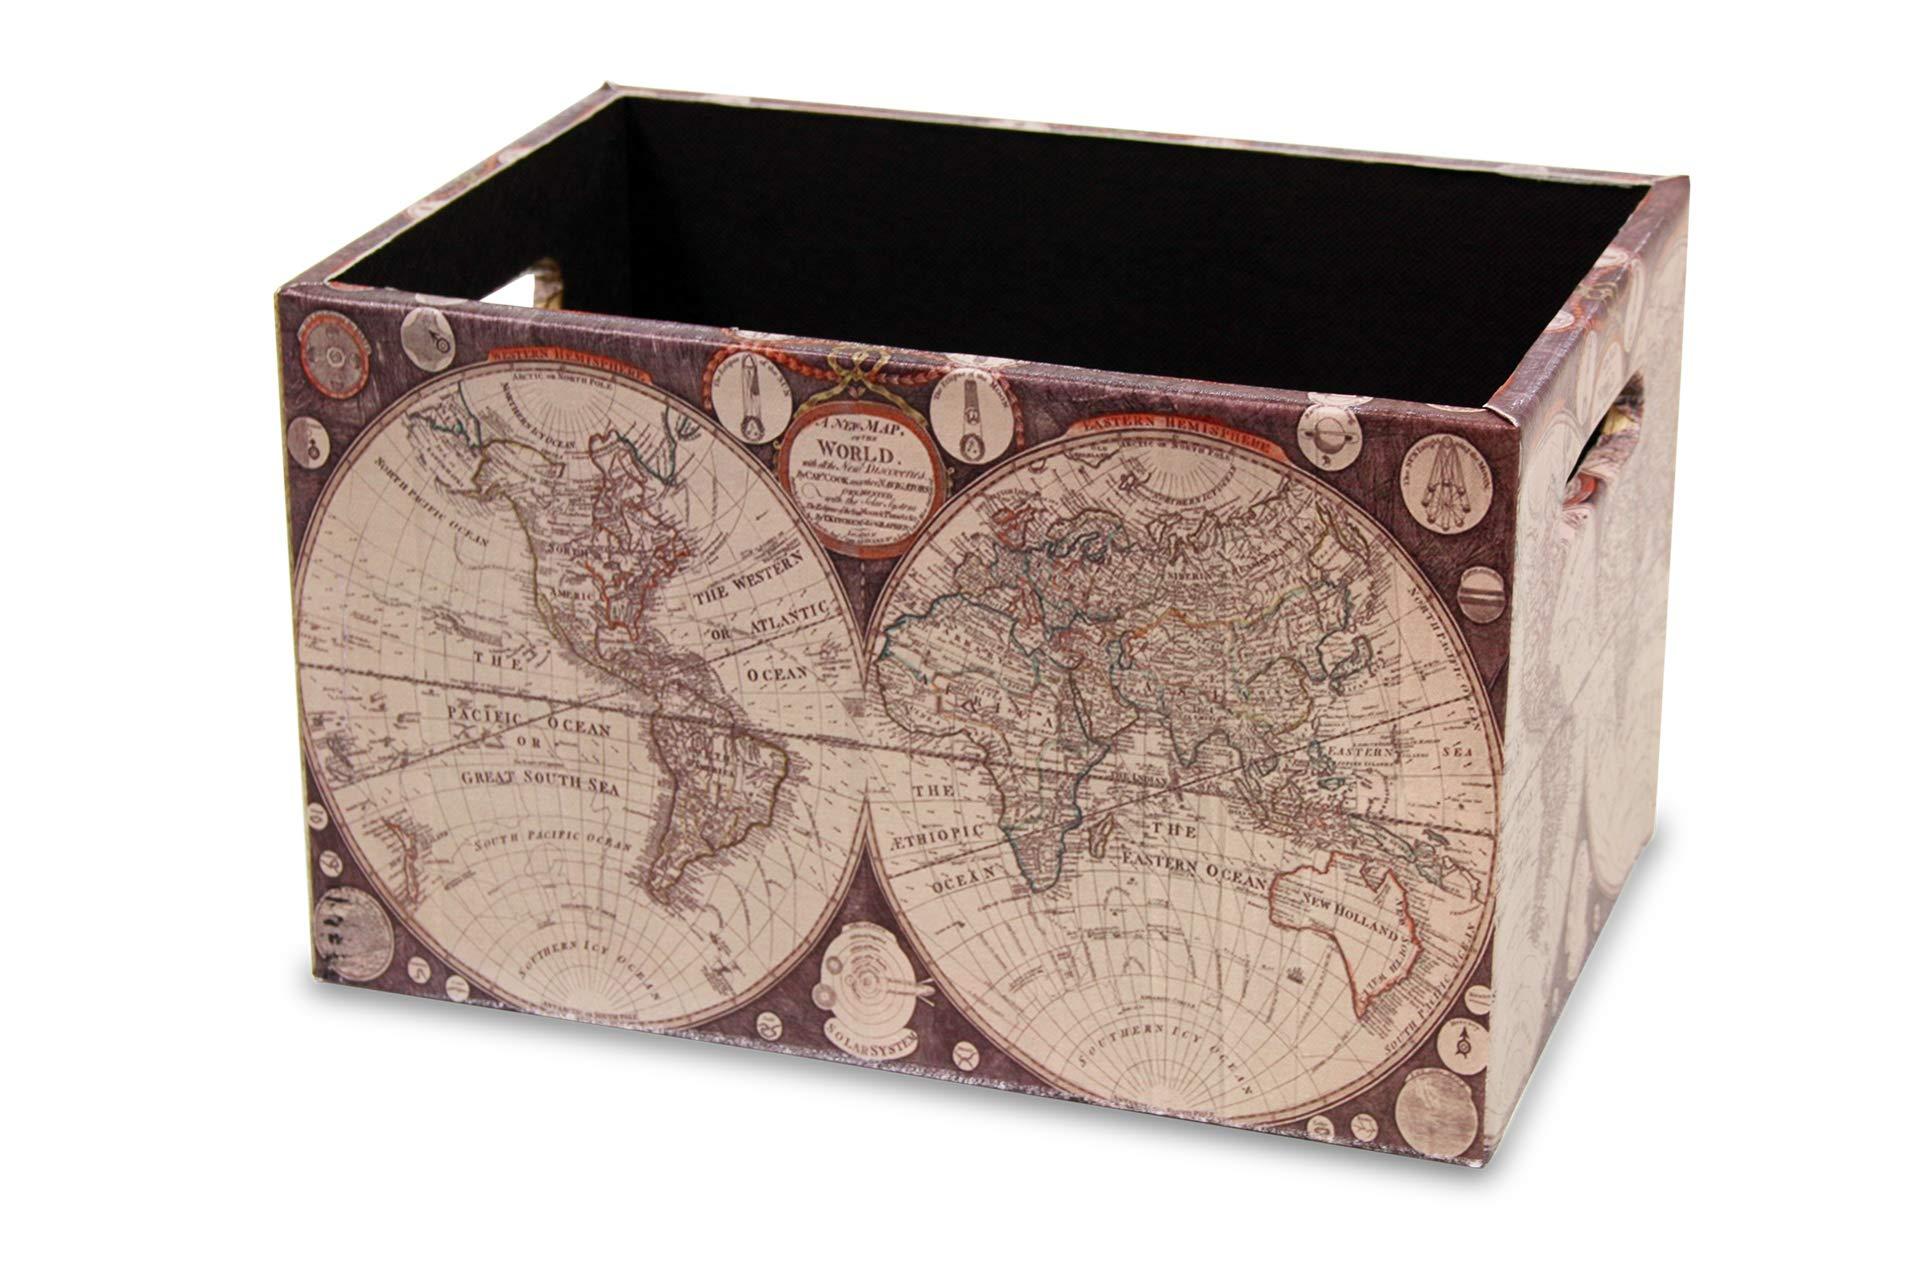 MIMBRE NATURAL Caja Madera Mundo (30x20x18): Amazon.es: Hogar